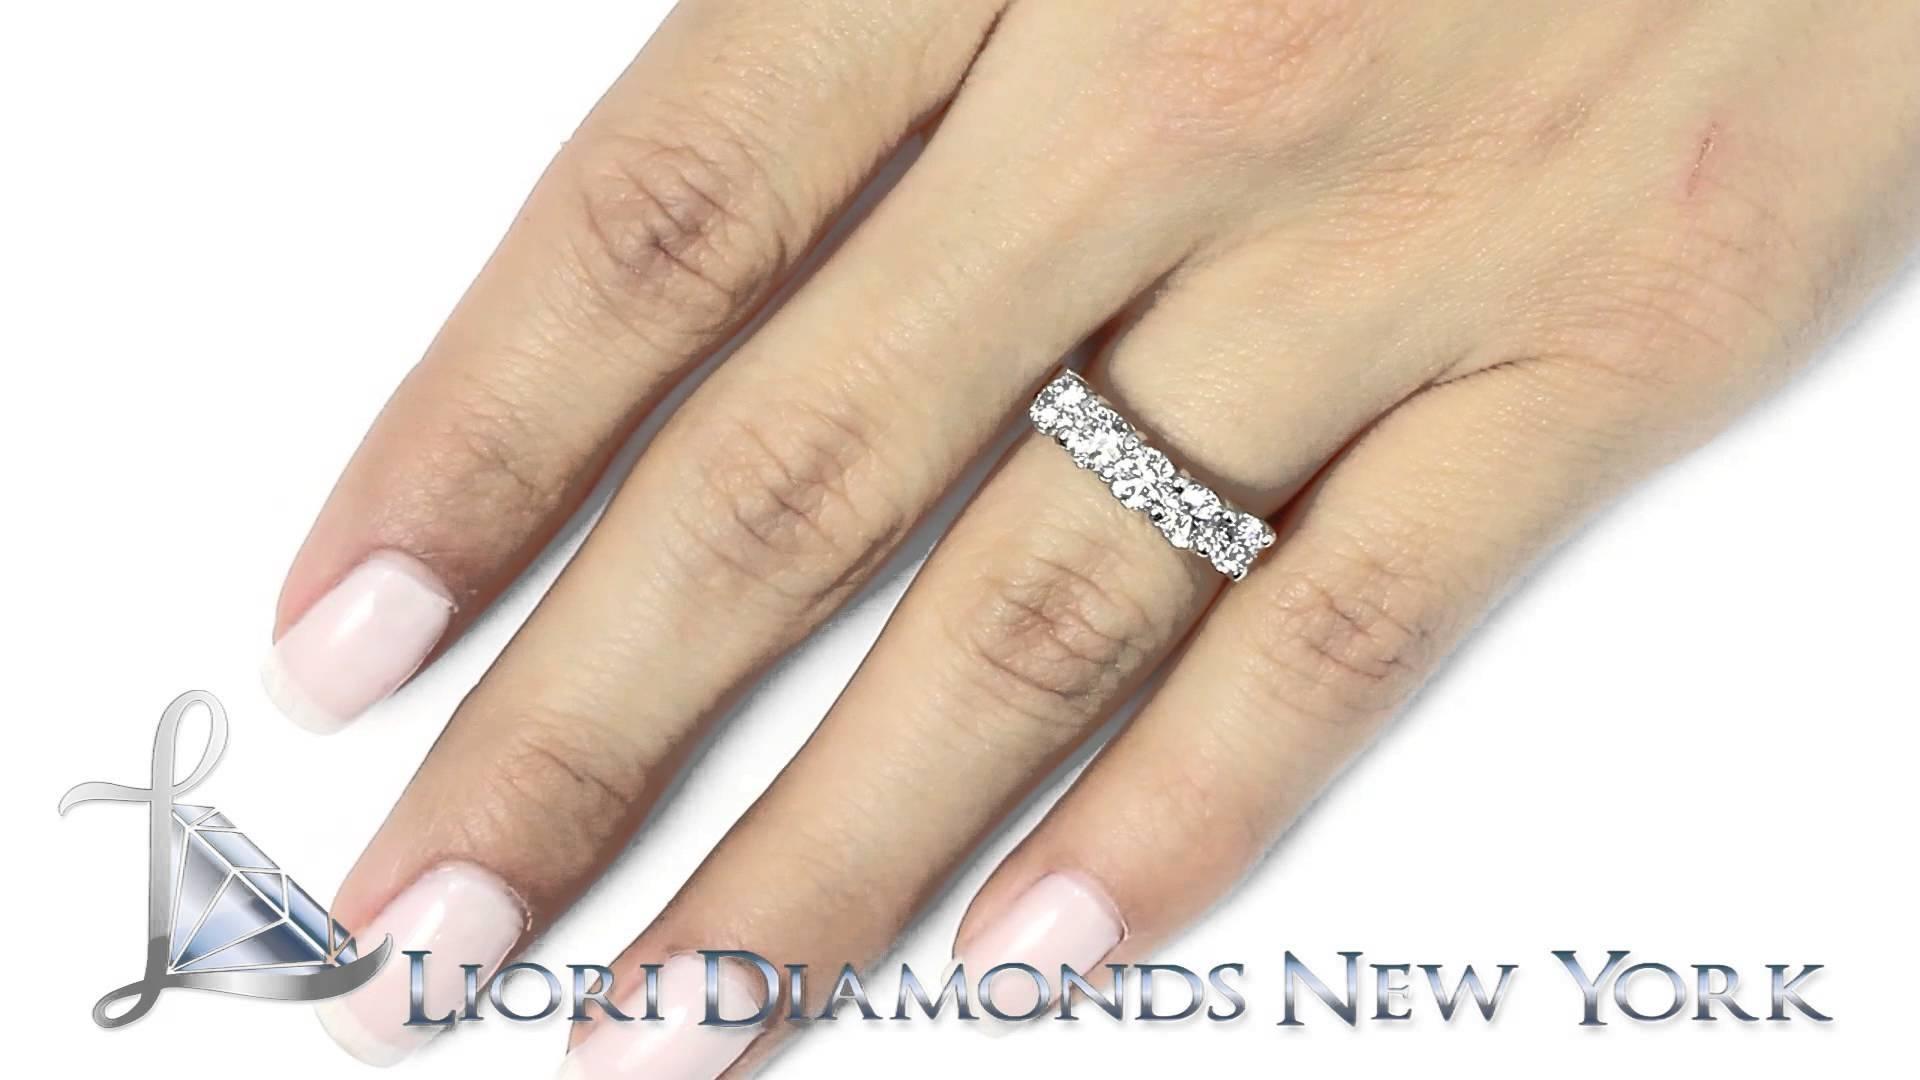 Wba 37 – 2.00 Carat E Vs1 5 Stone Diamond Wedding Band Anniversary In Current 3 Carat Diamond Anniversary Rings (Gallery 24 of 25)